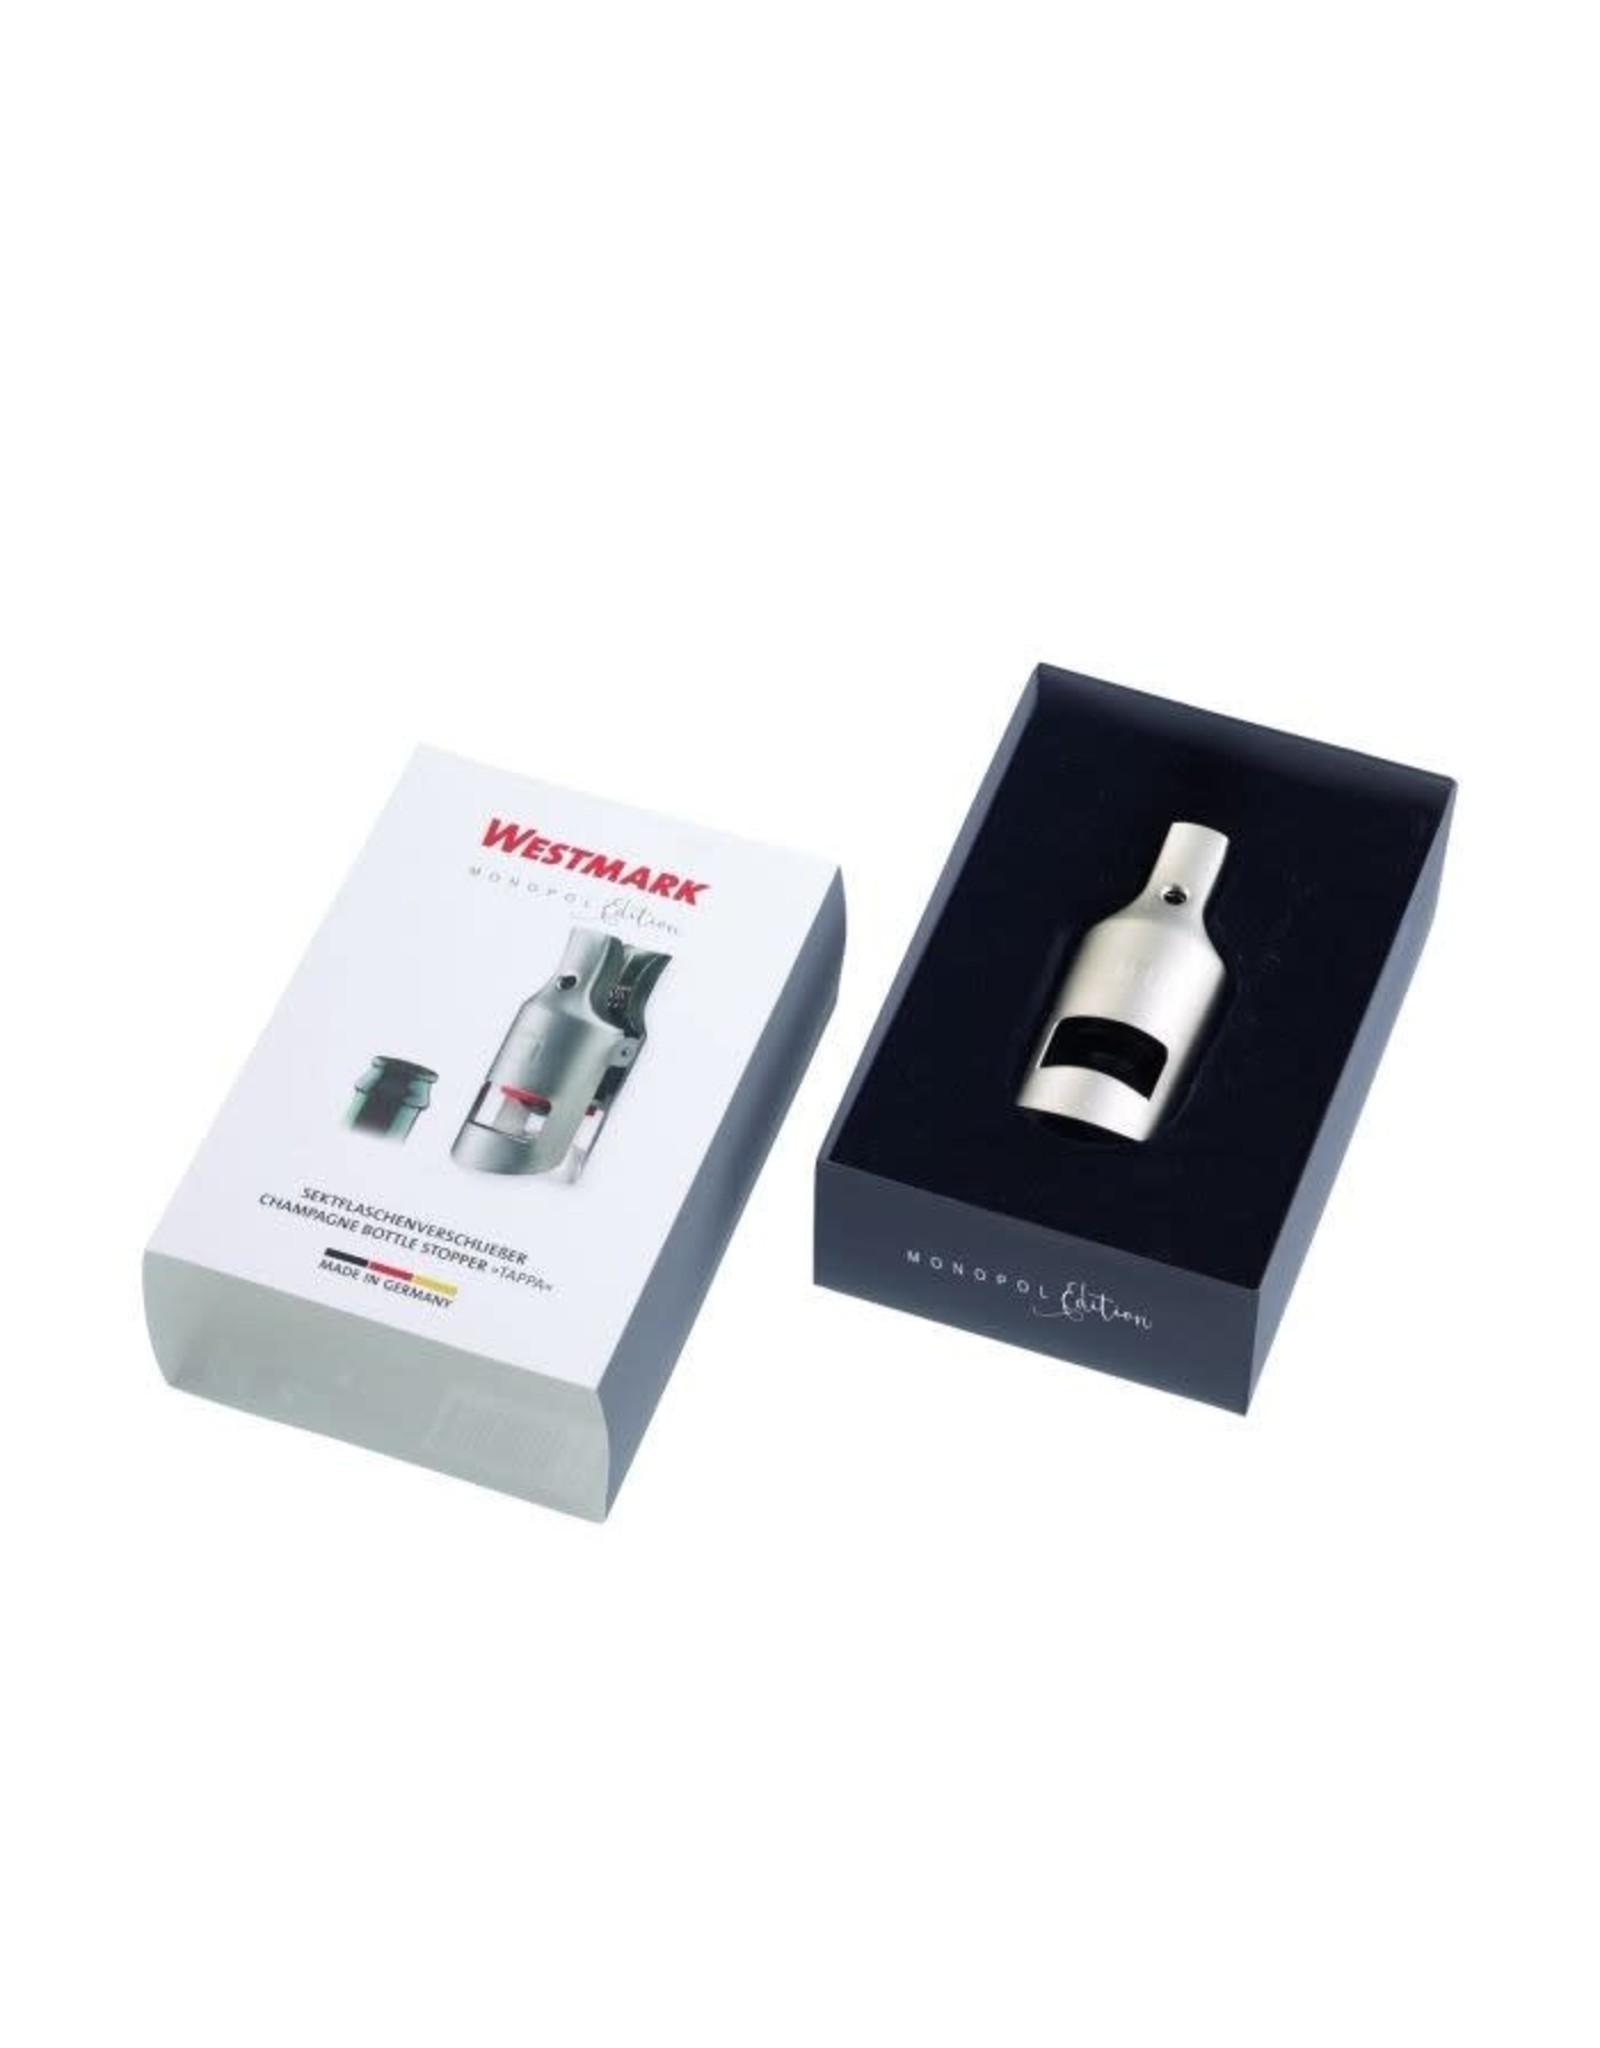 Westmark WESTMARK Tappa Champagne Sealer